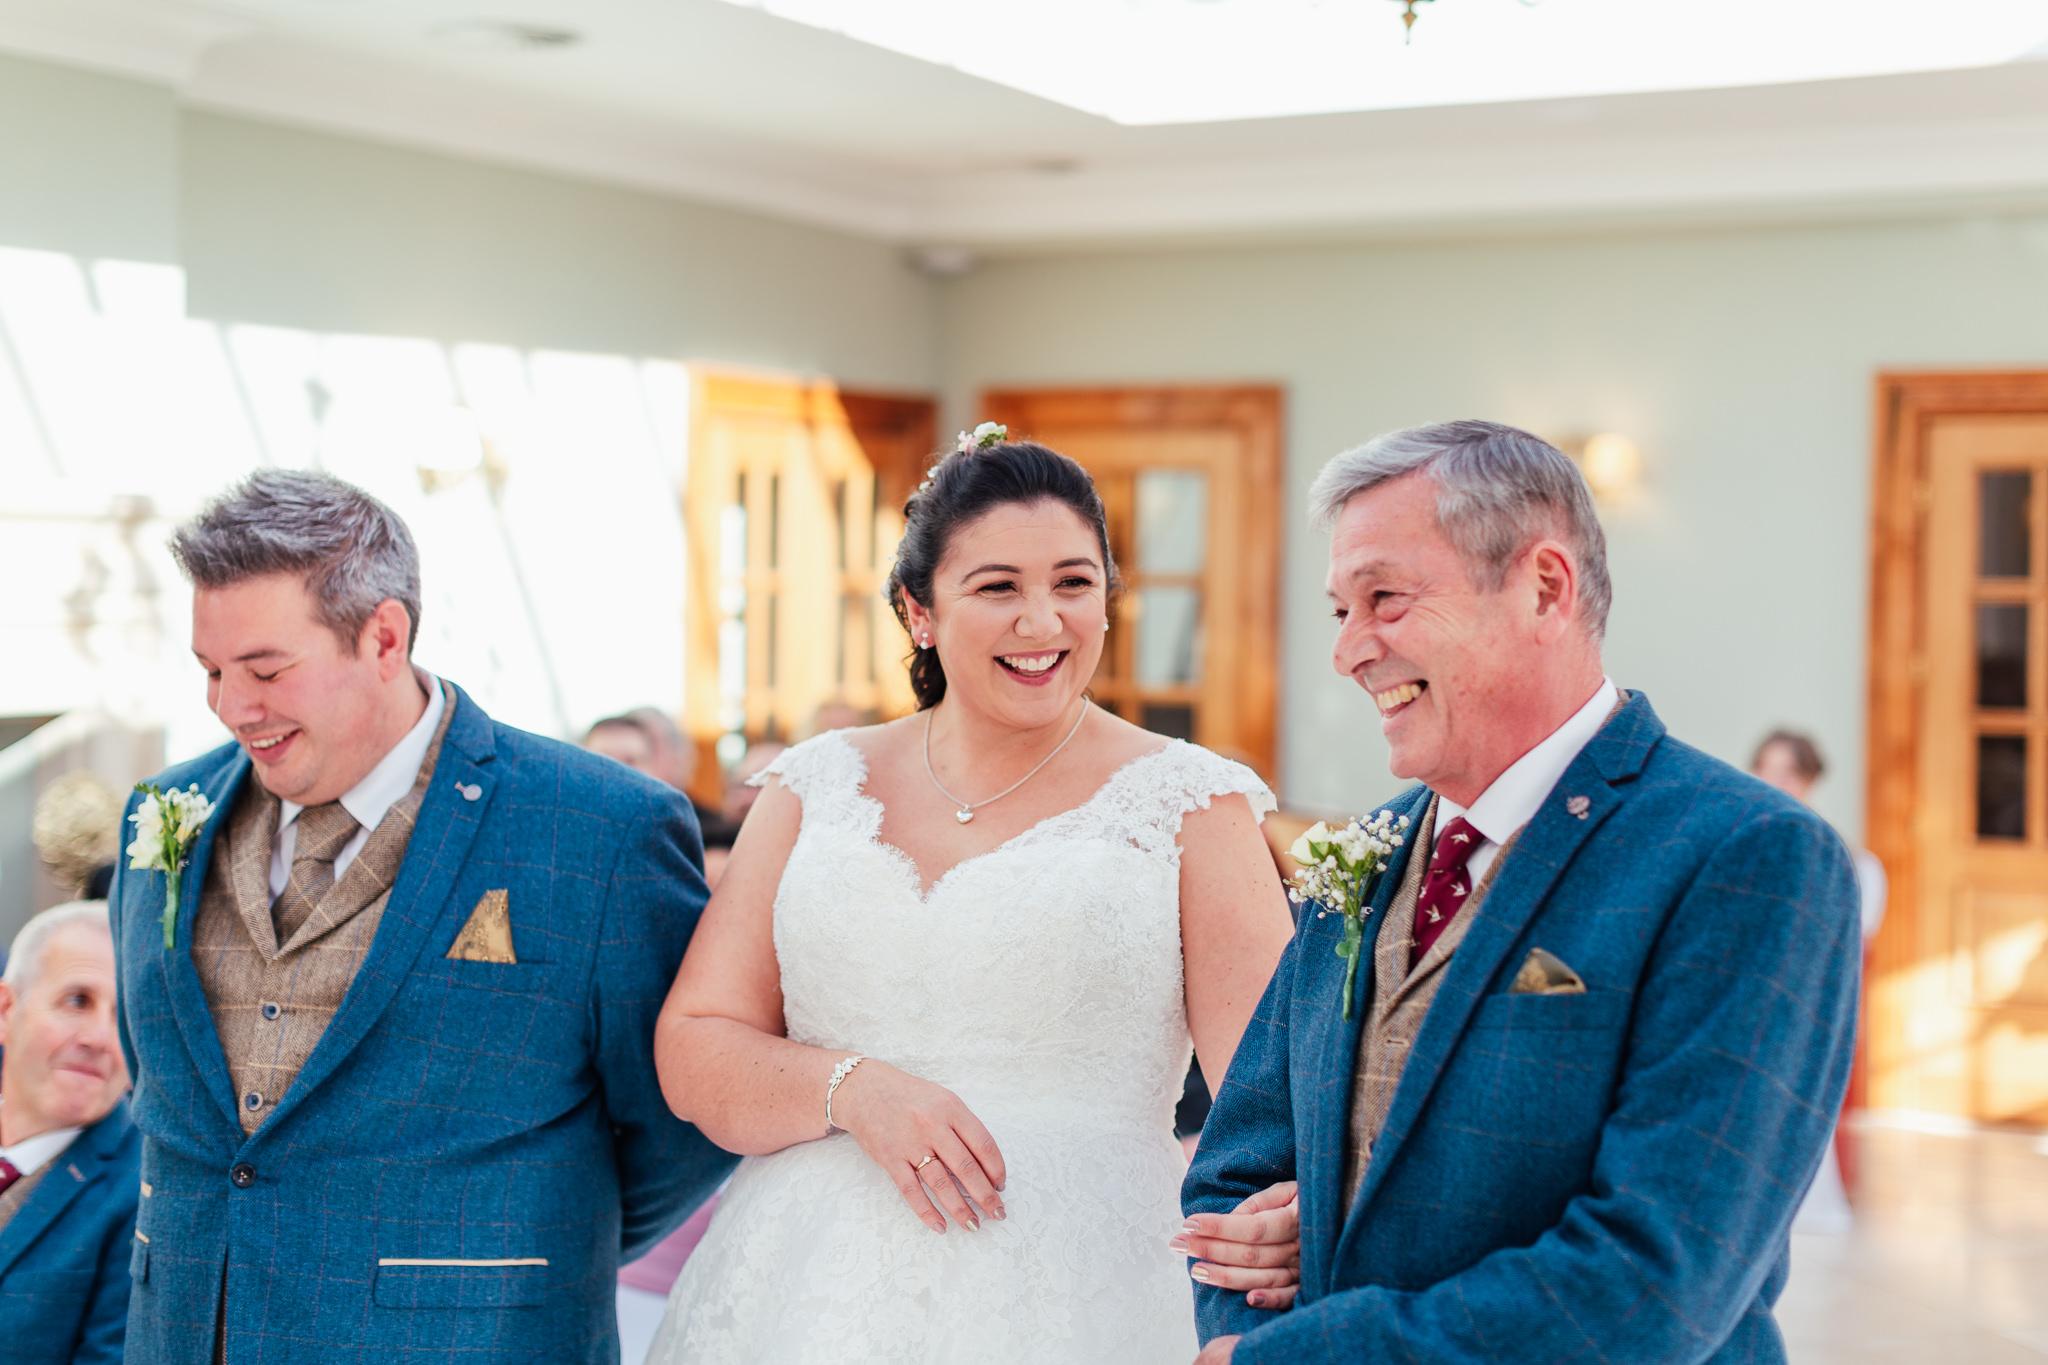 Willington-Hall-Cheshire-Wedding-15.jpg